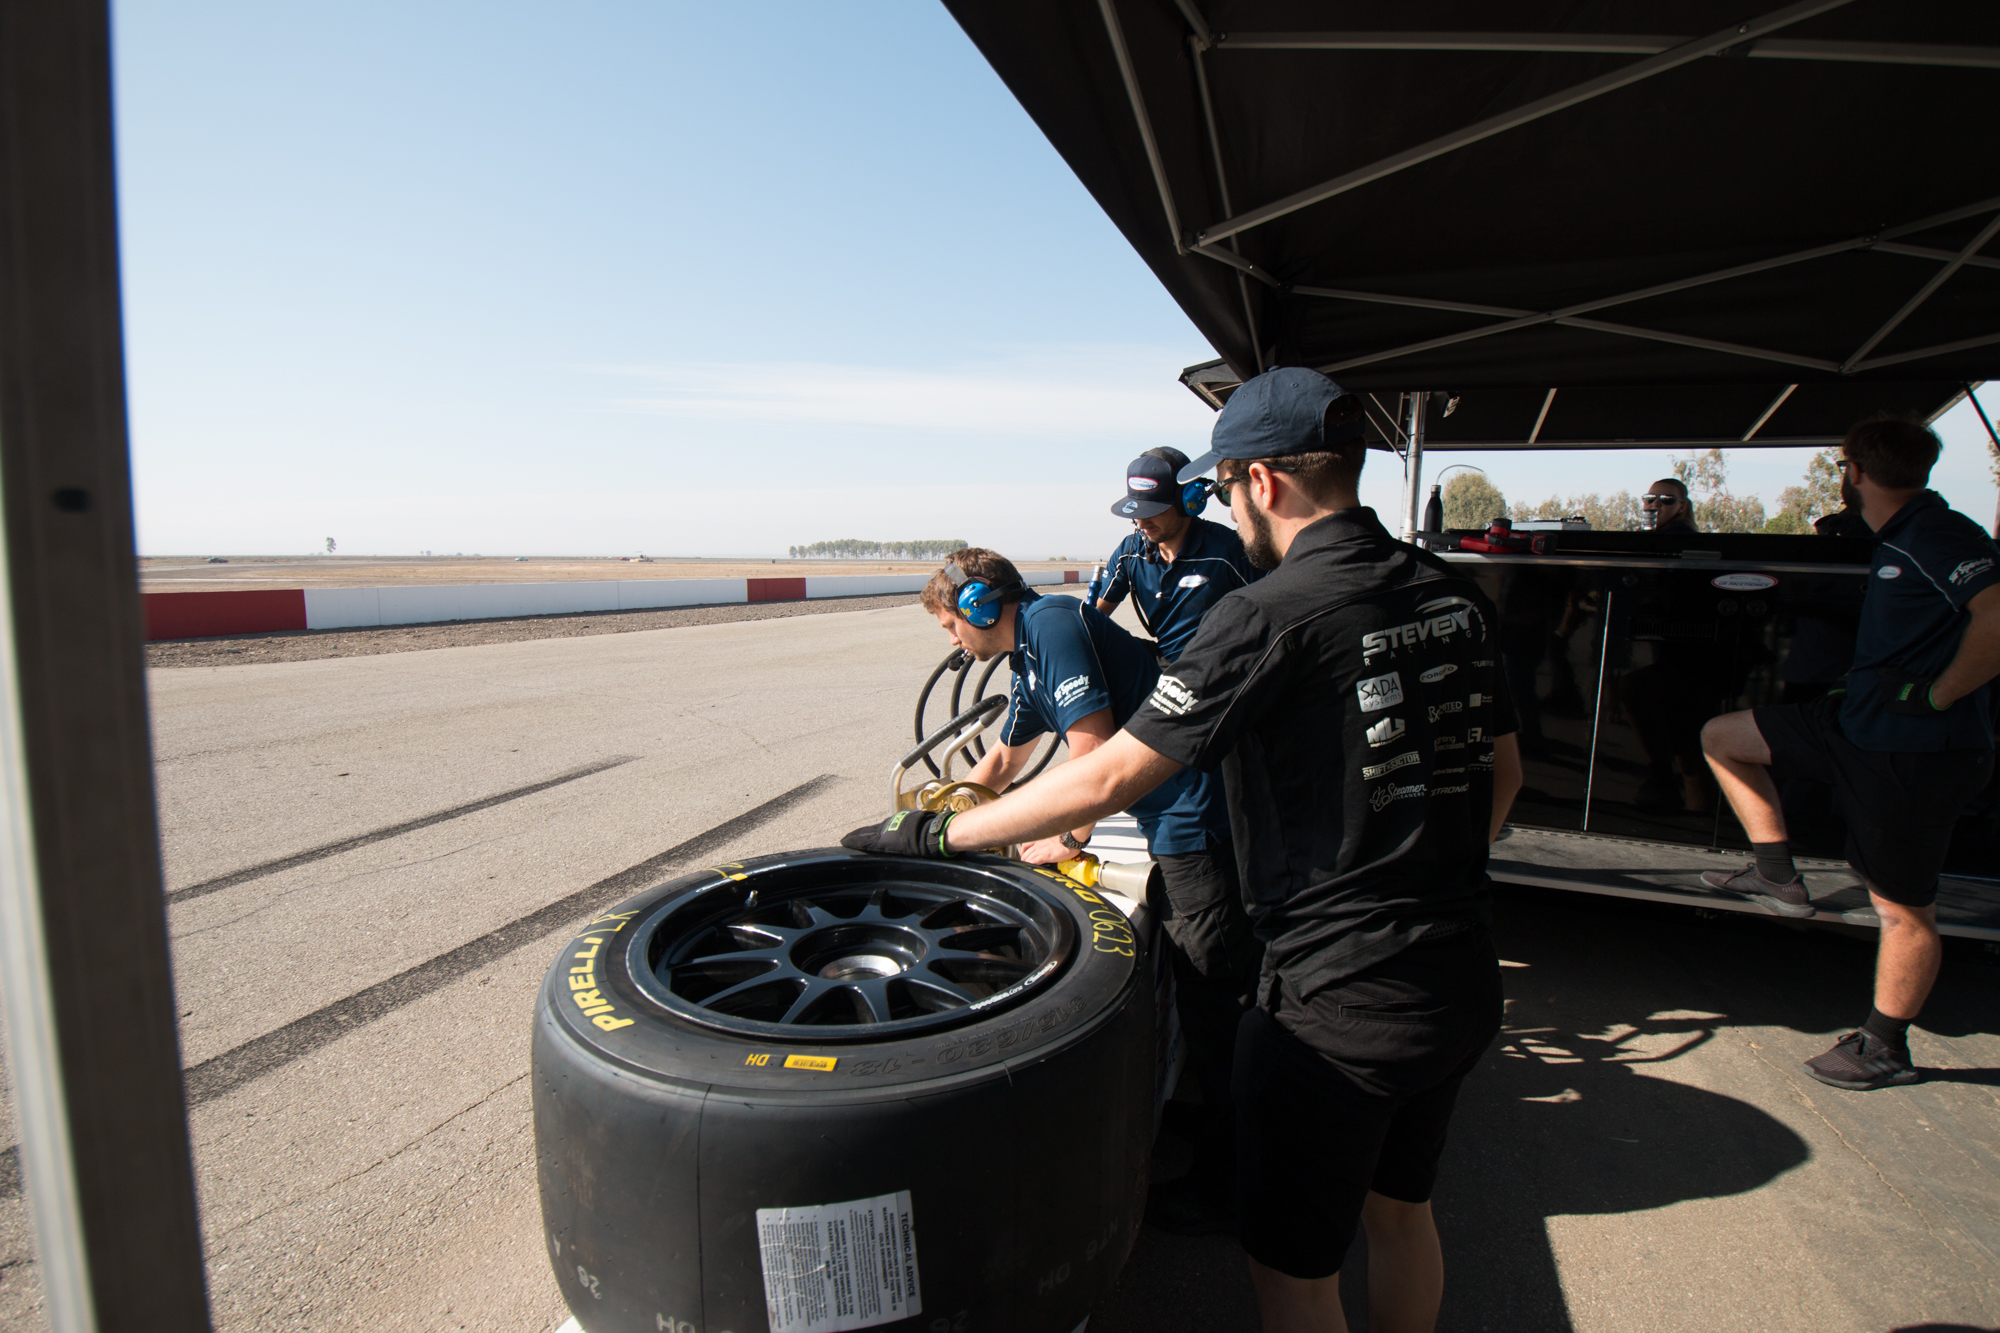 Steven-Racing-20130228-55333.jpg